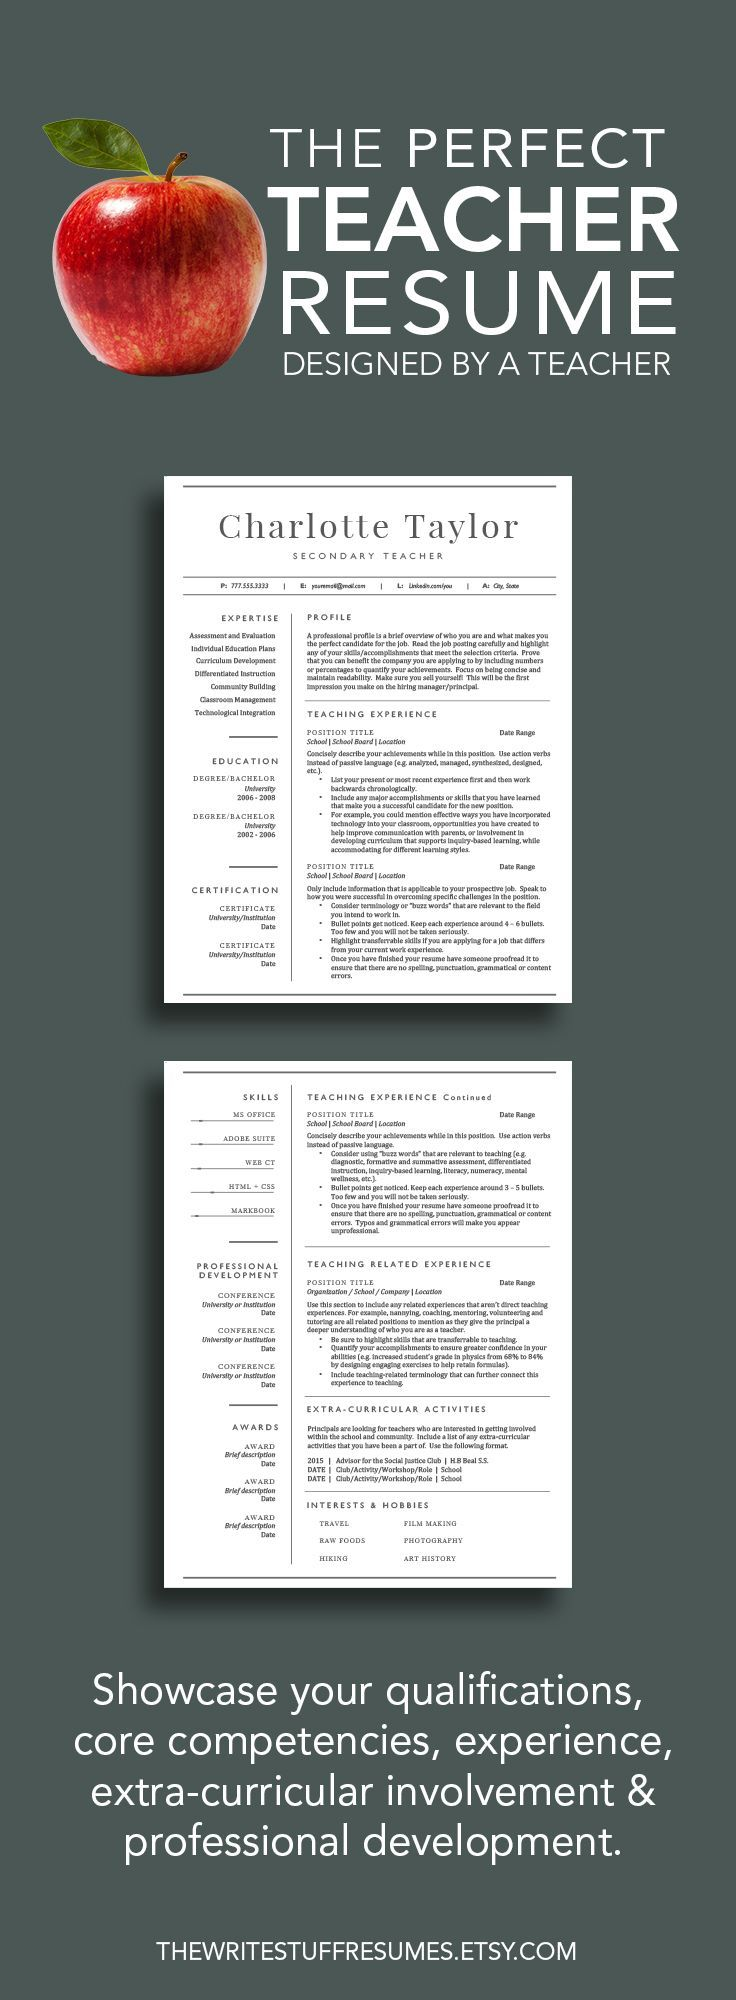 Perfect Resume For Teacher Job